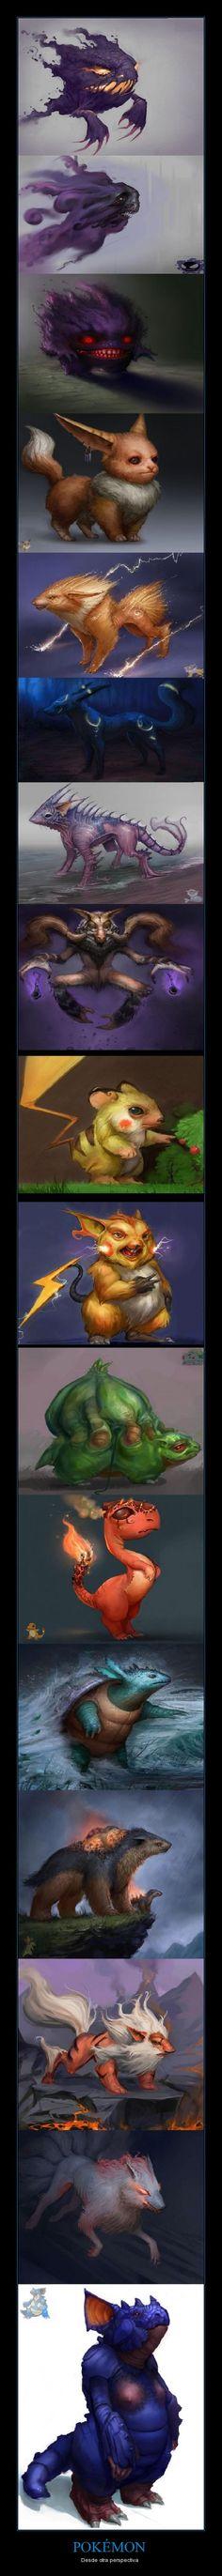 Pokemon, realistic illustrations